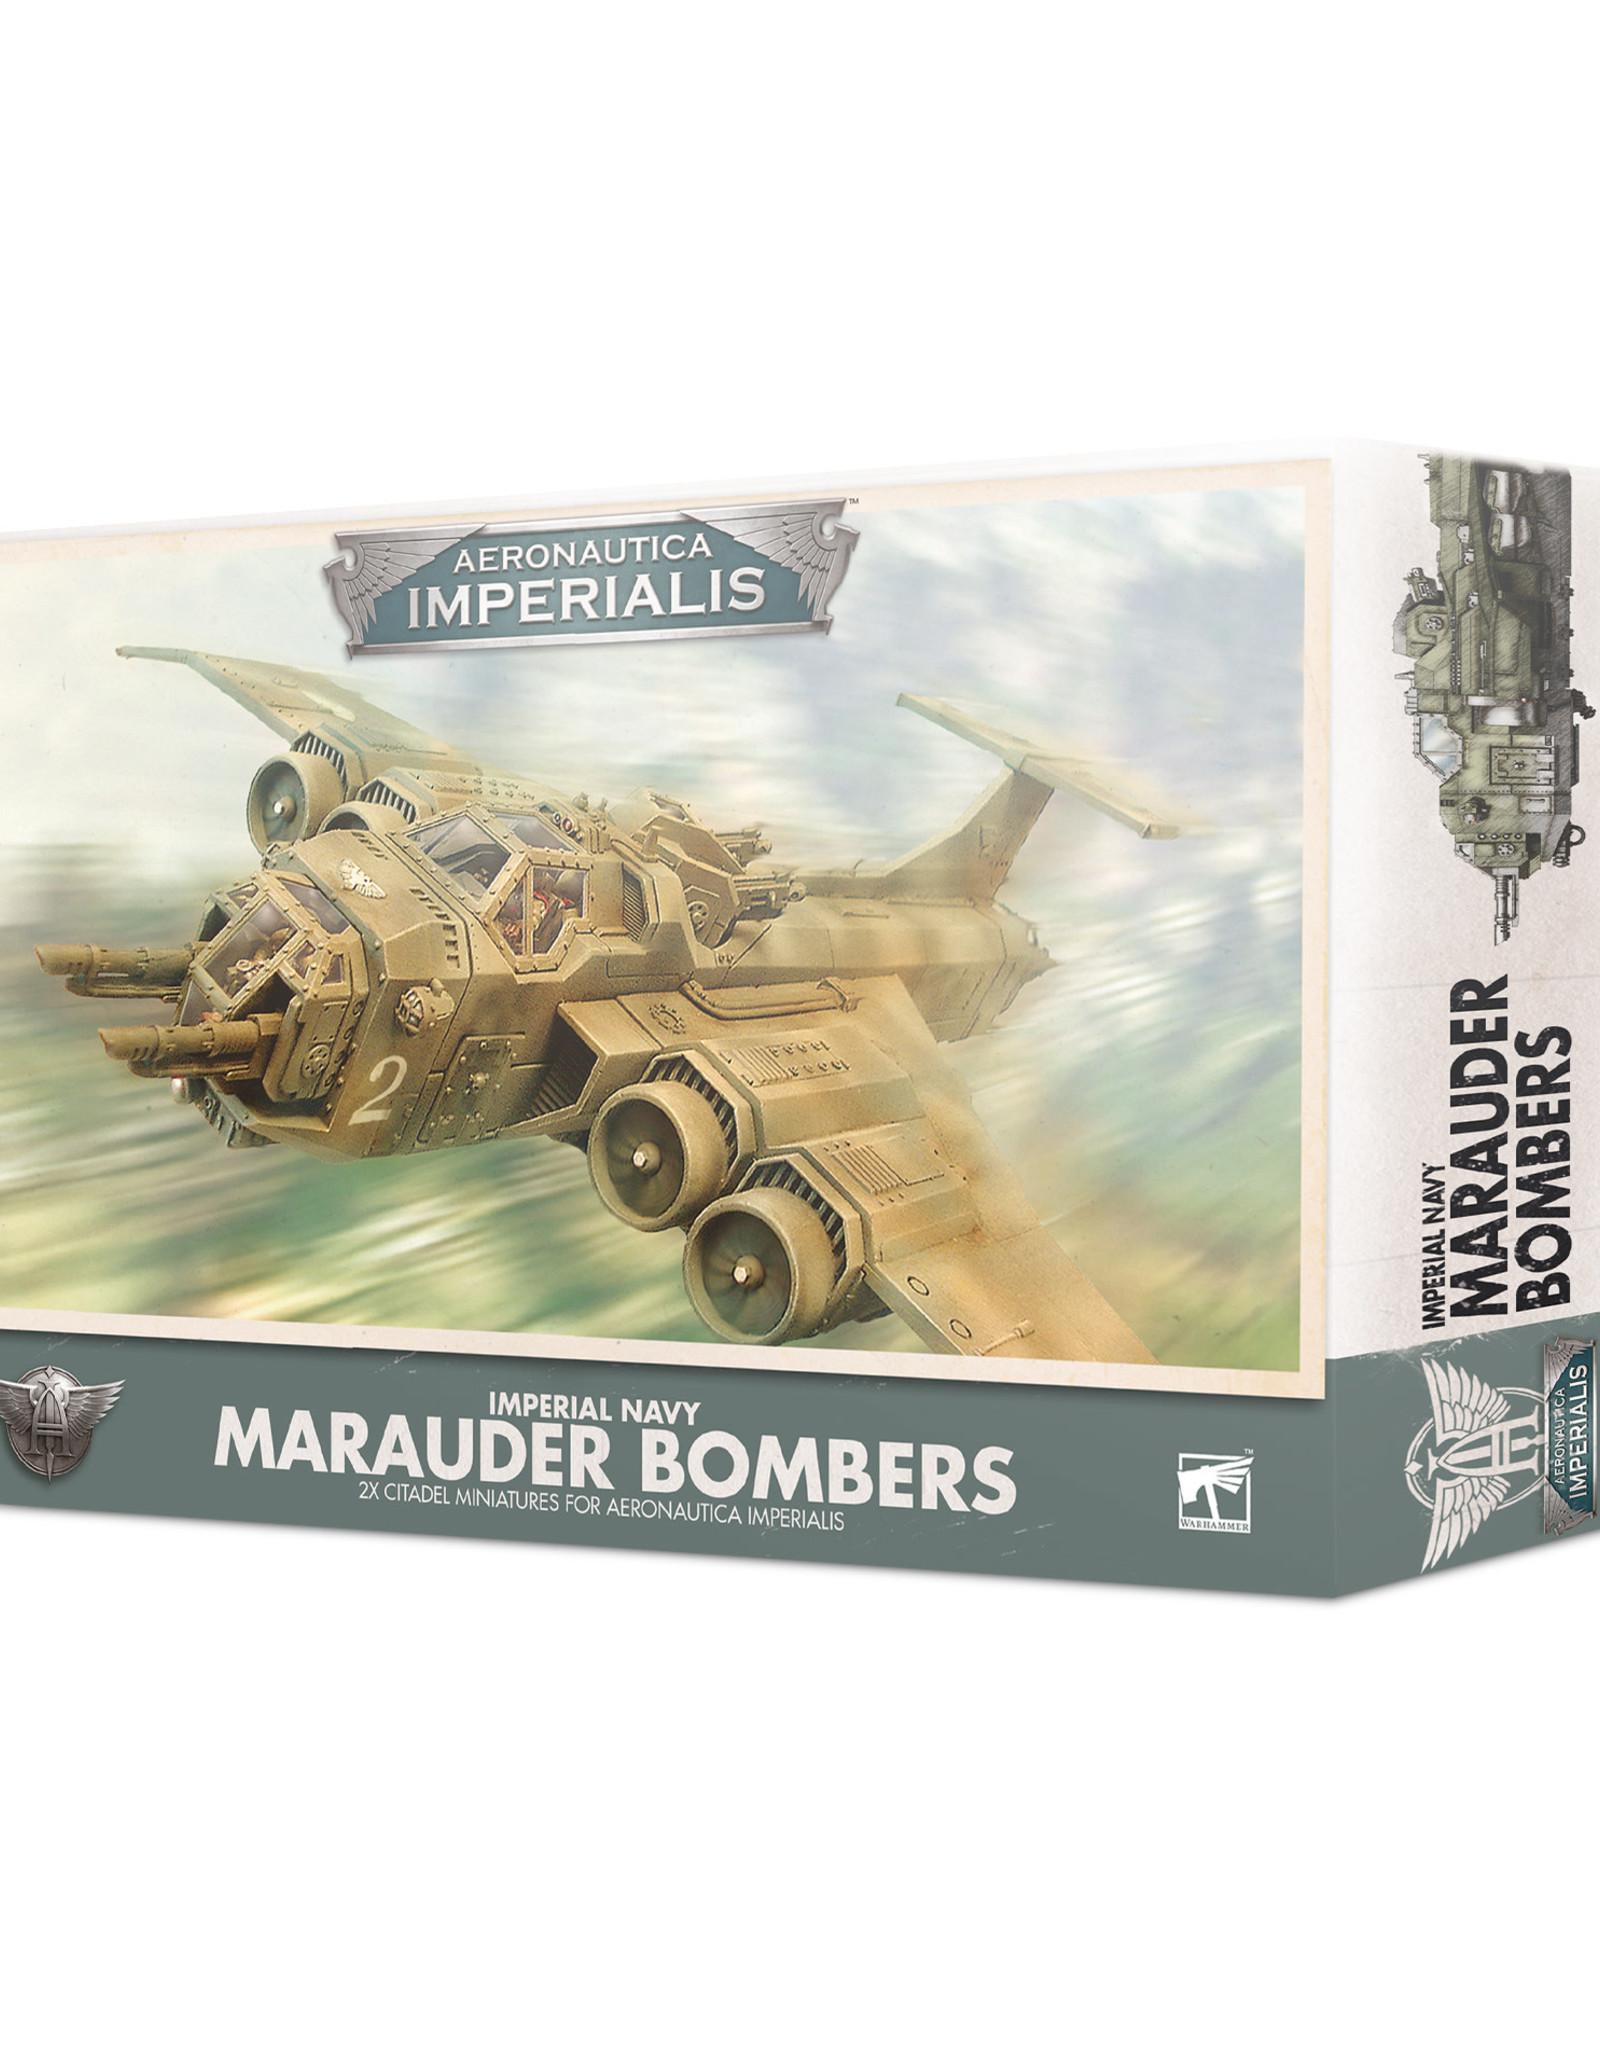 Aeronautica Imperialis Aeronautica Imperialis: Imperial Navy Marauder Bombers